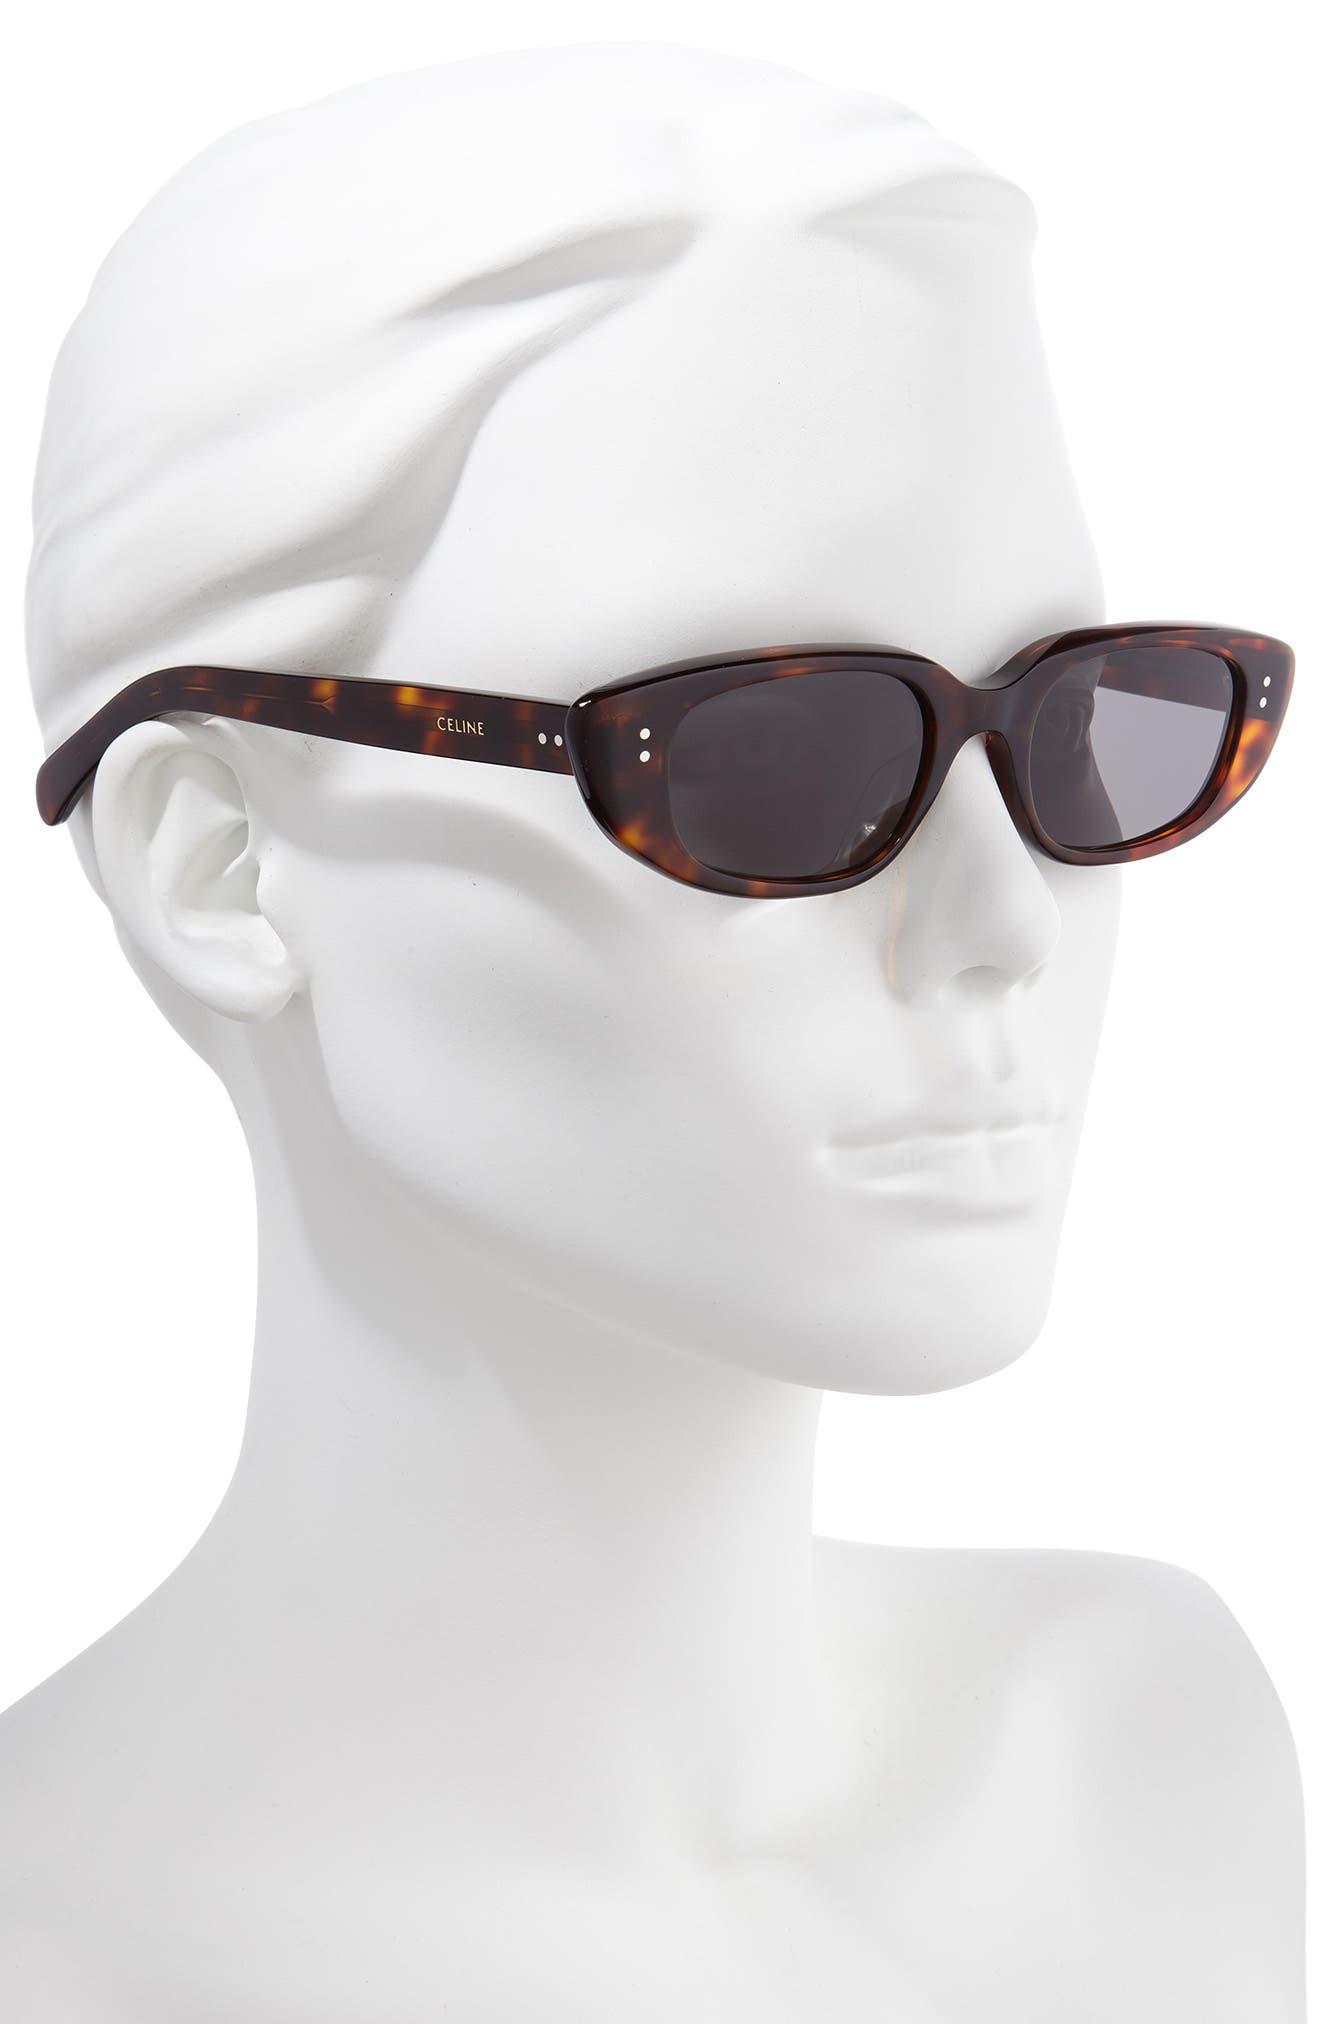 CELINE Sunglasses 51mm Oval Cat Eye Sunglasses